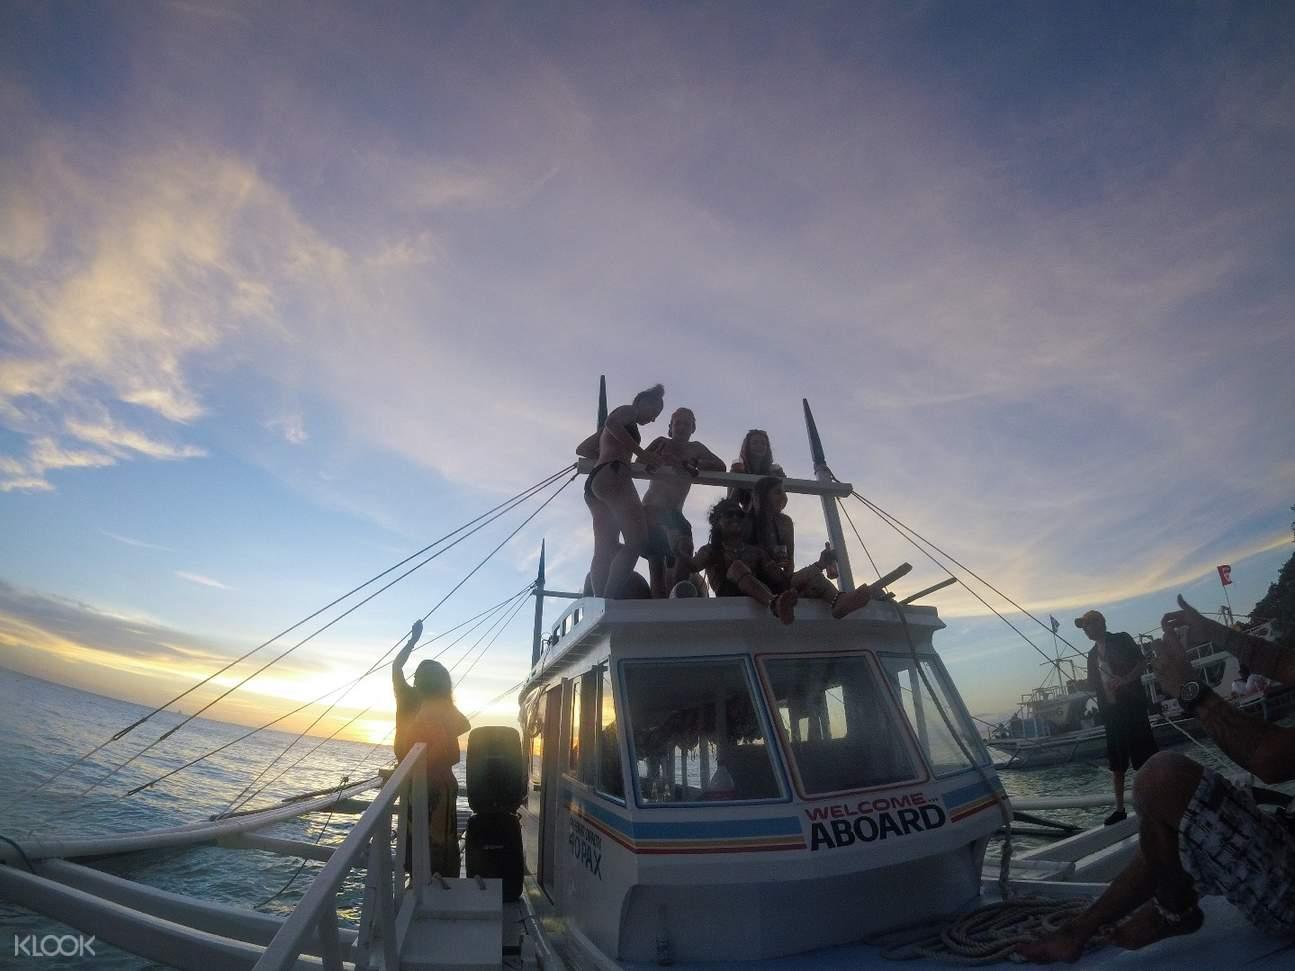 Boat tour boracay